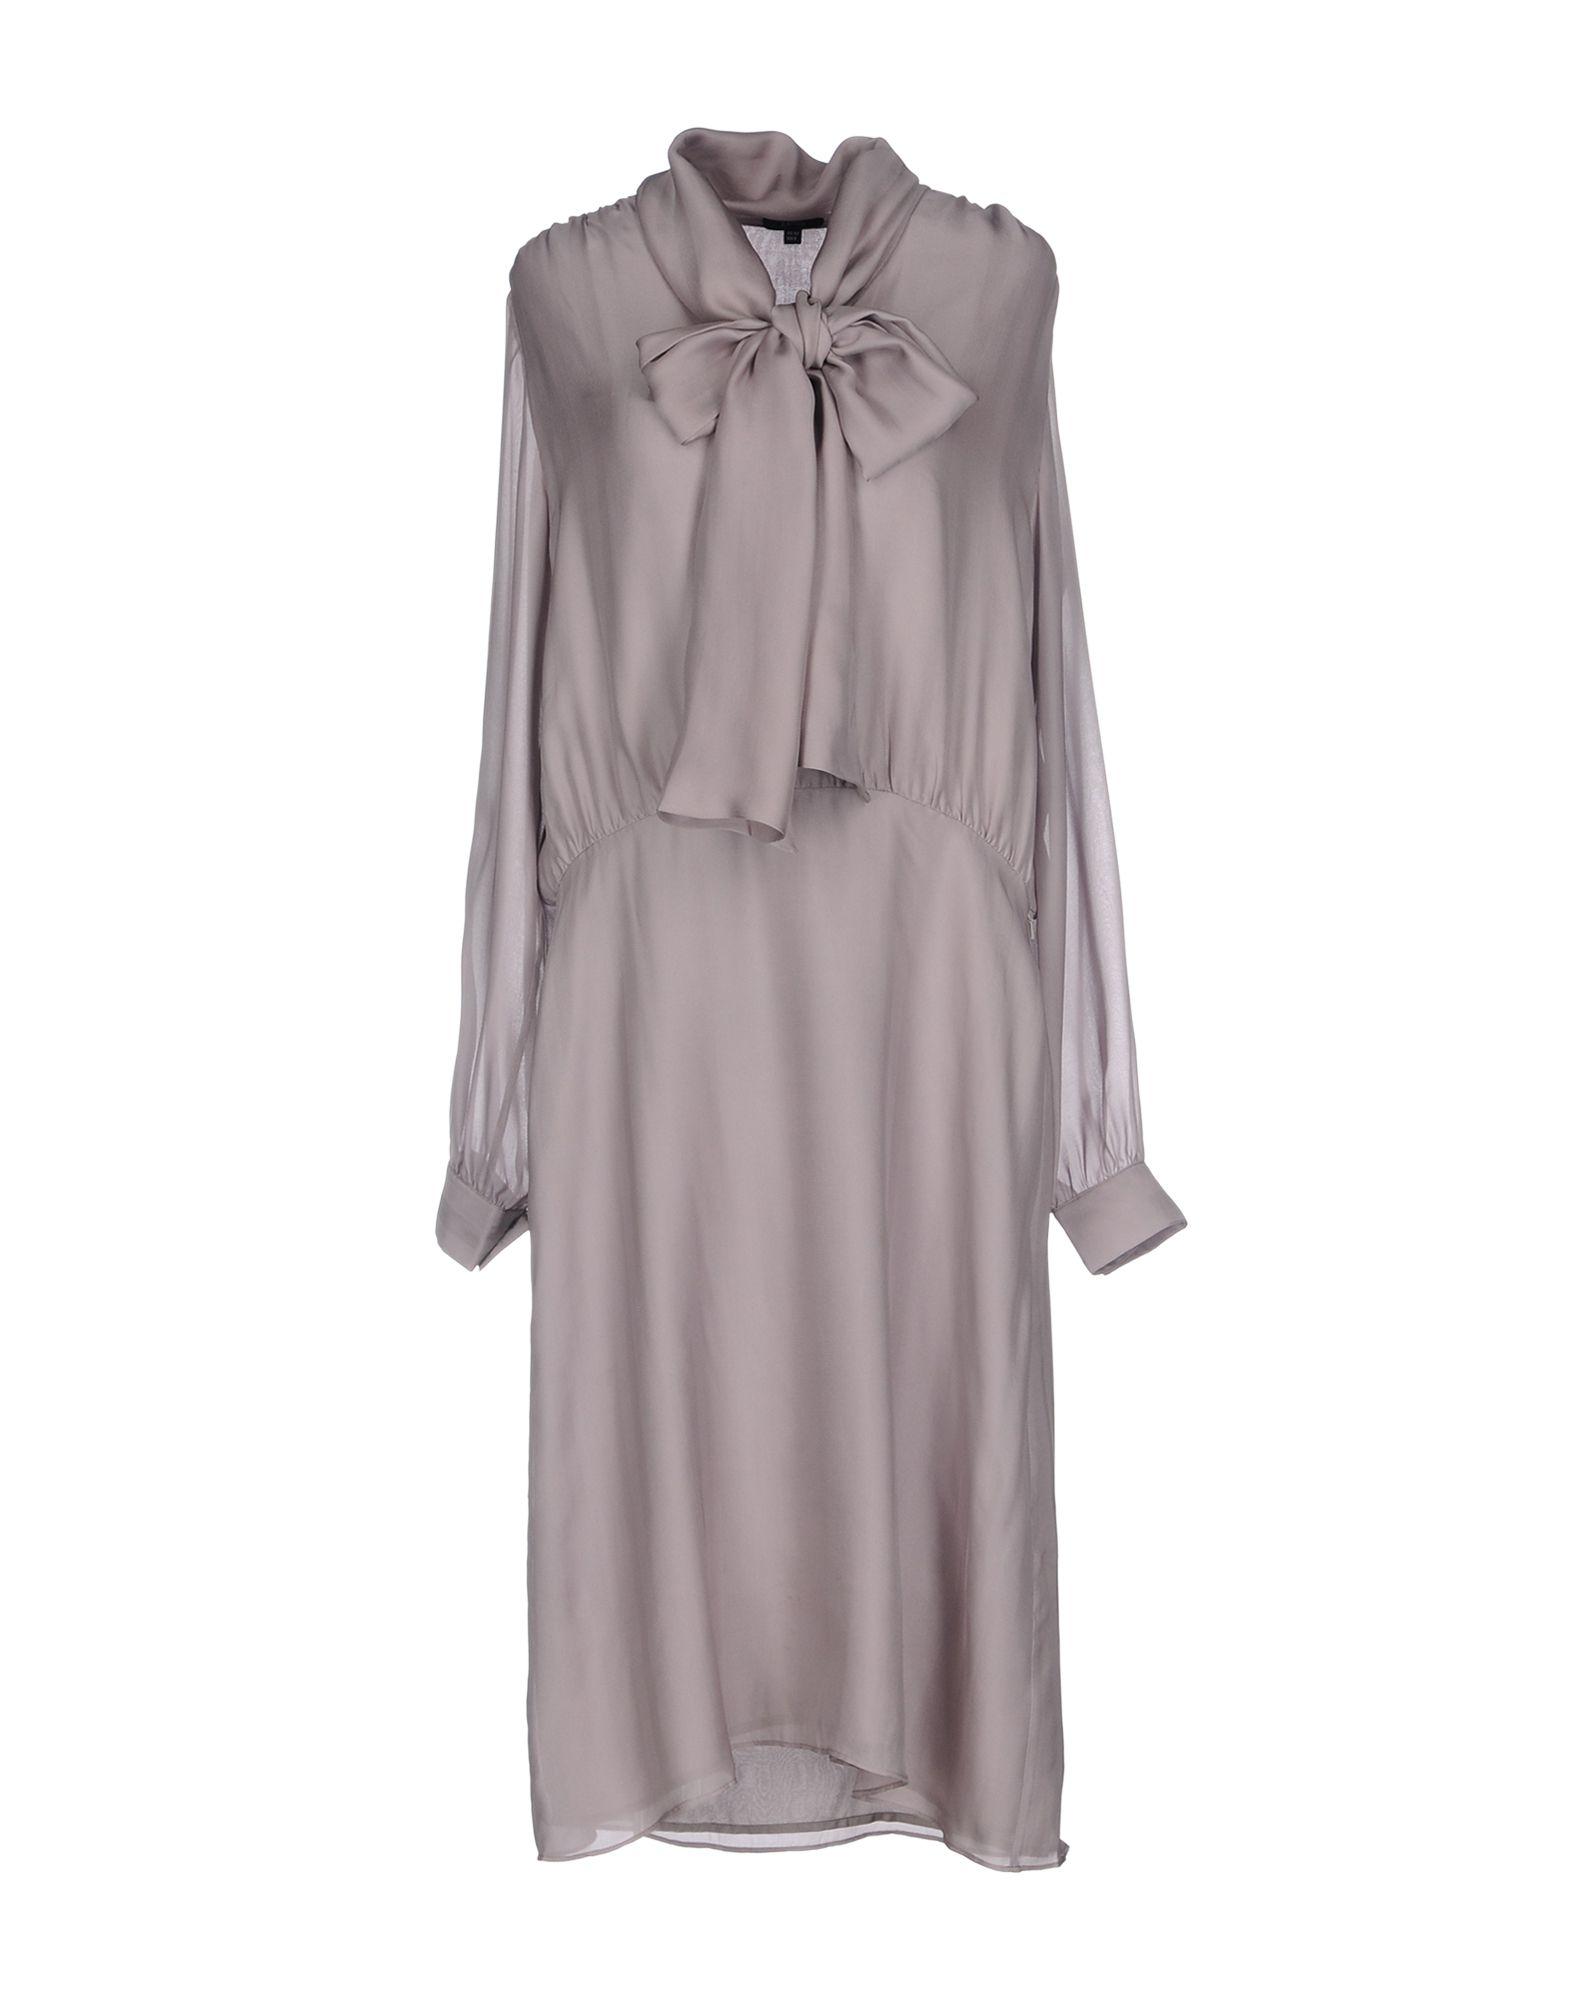 RAOUL Платье длиной 3/4 lisa corti платье длиной 3 4